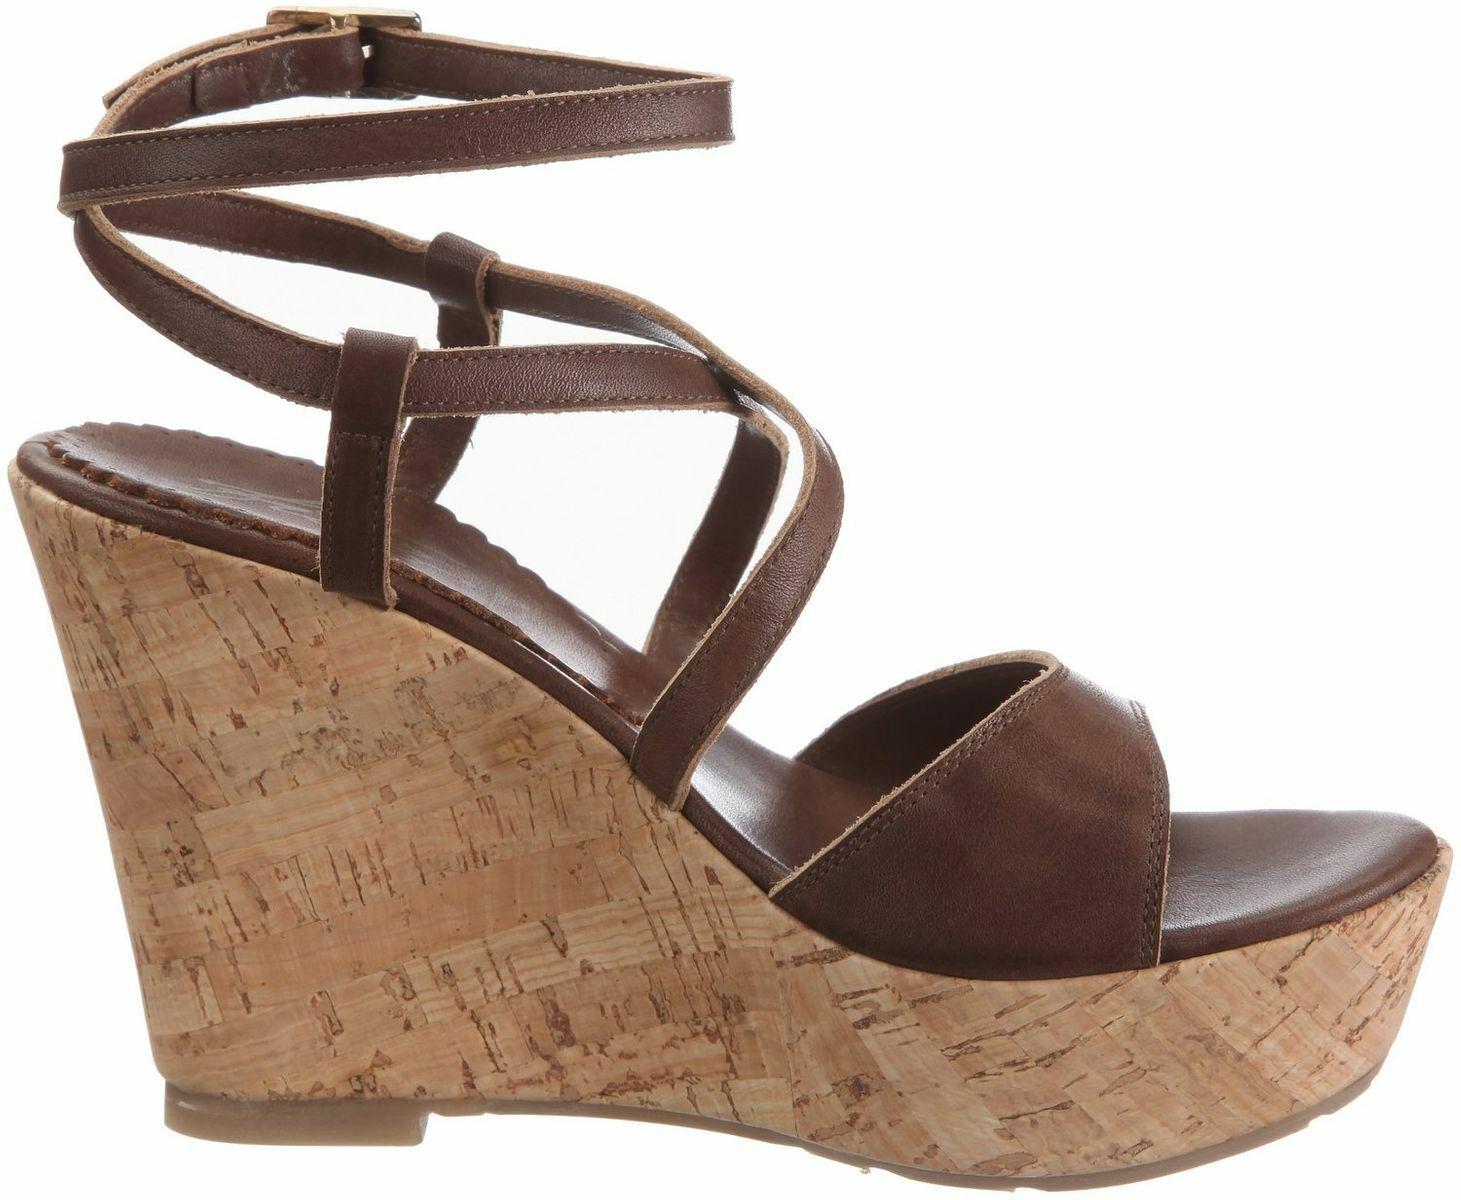 Fitzroy plataforma sandalias de cuero marrón Vivian